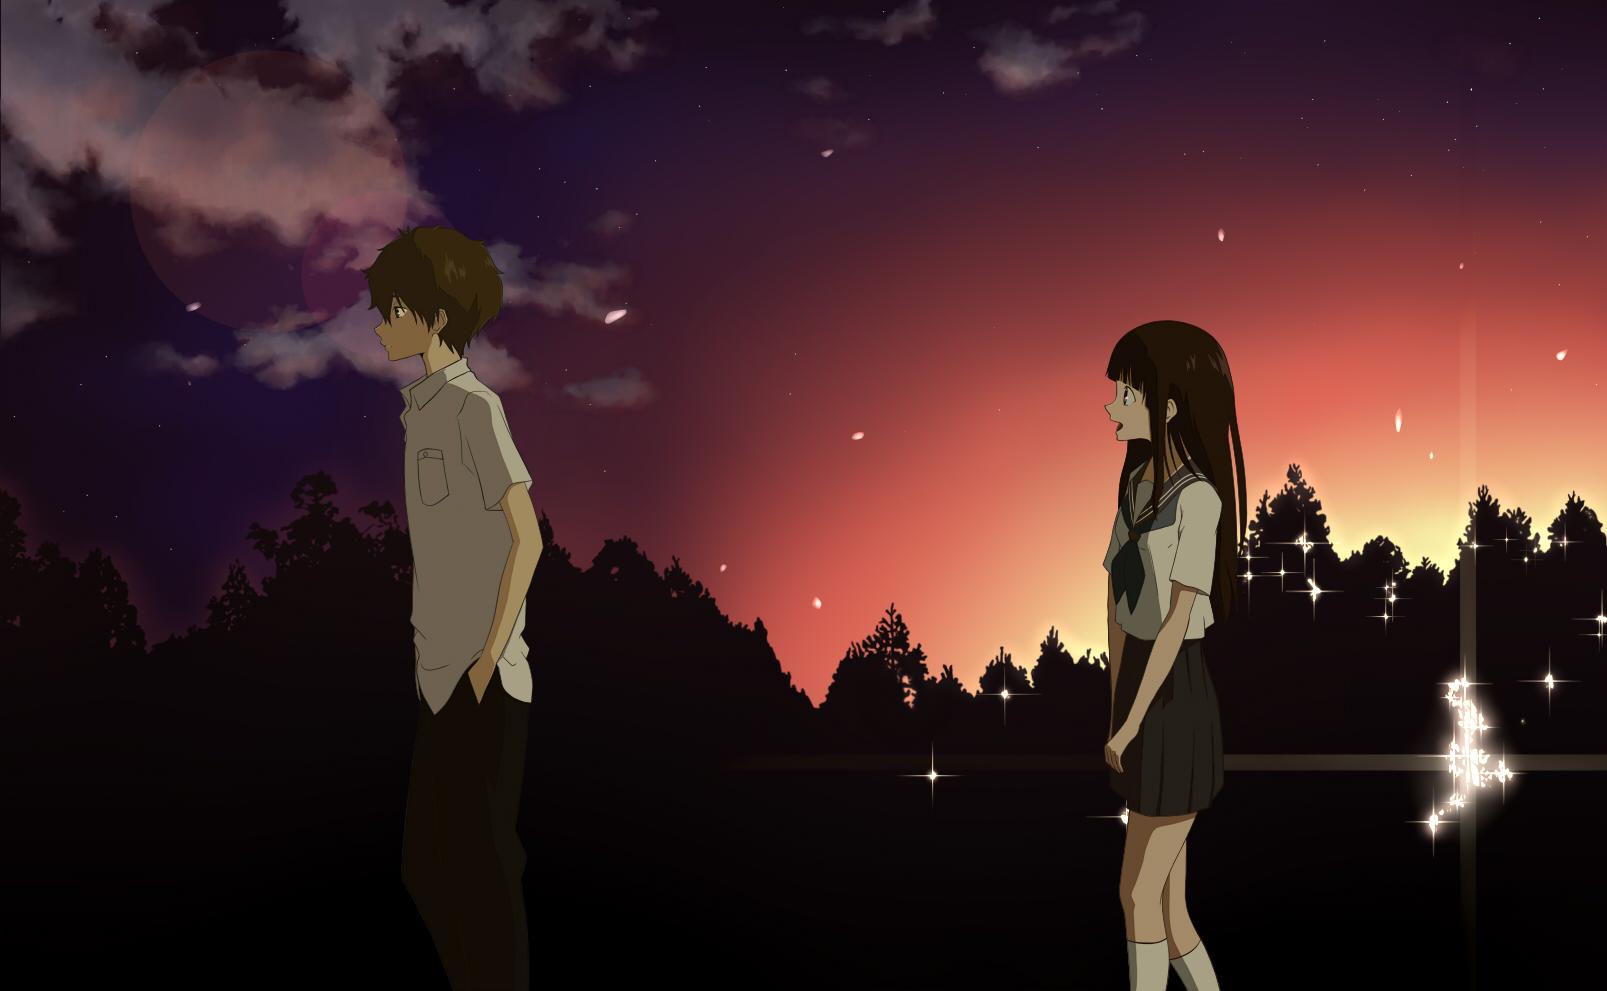 images?q=tbn:ANd9GcQh_l3eQ5xwiPy07kGEXjmjgmBKBRB7H2mRxCGhv1tFWg5c_mWT Ideas For Anime Art Like Hyouka @koolgadgetz.com.info